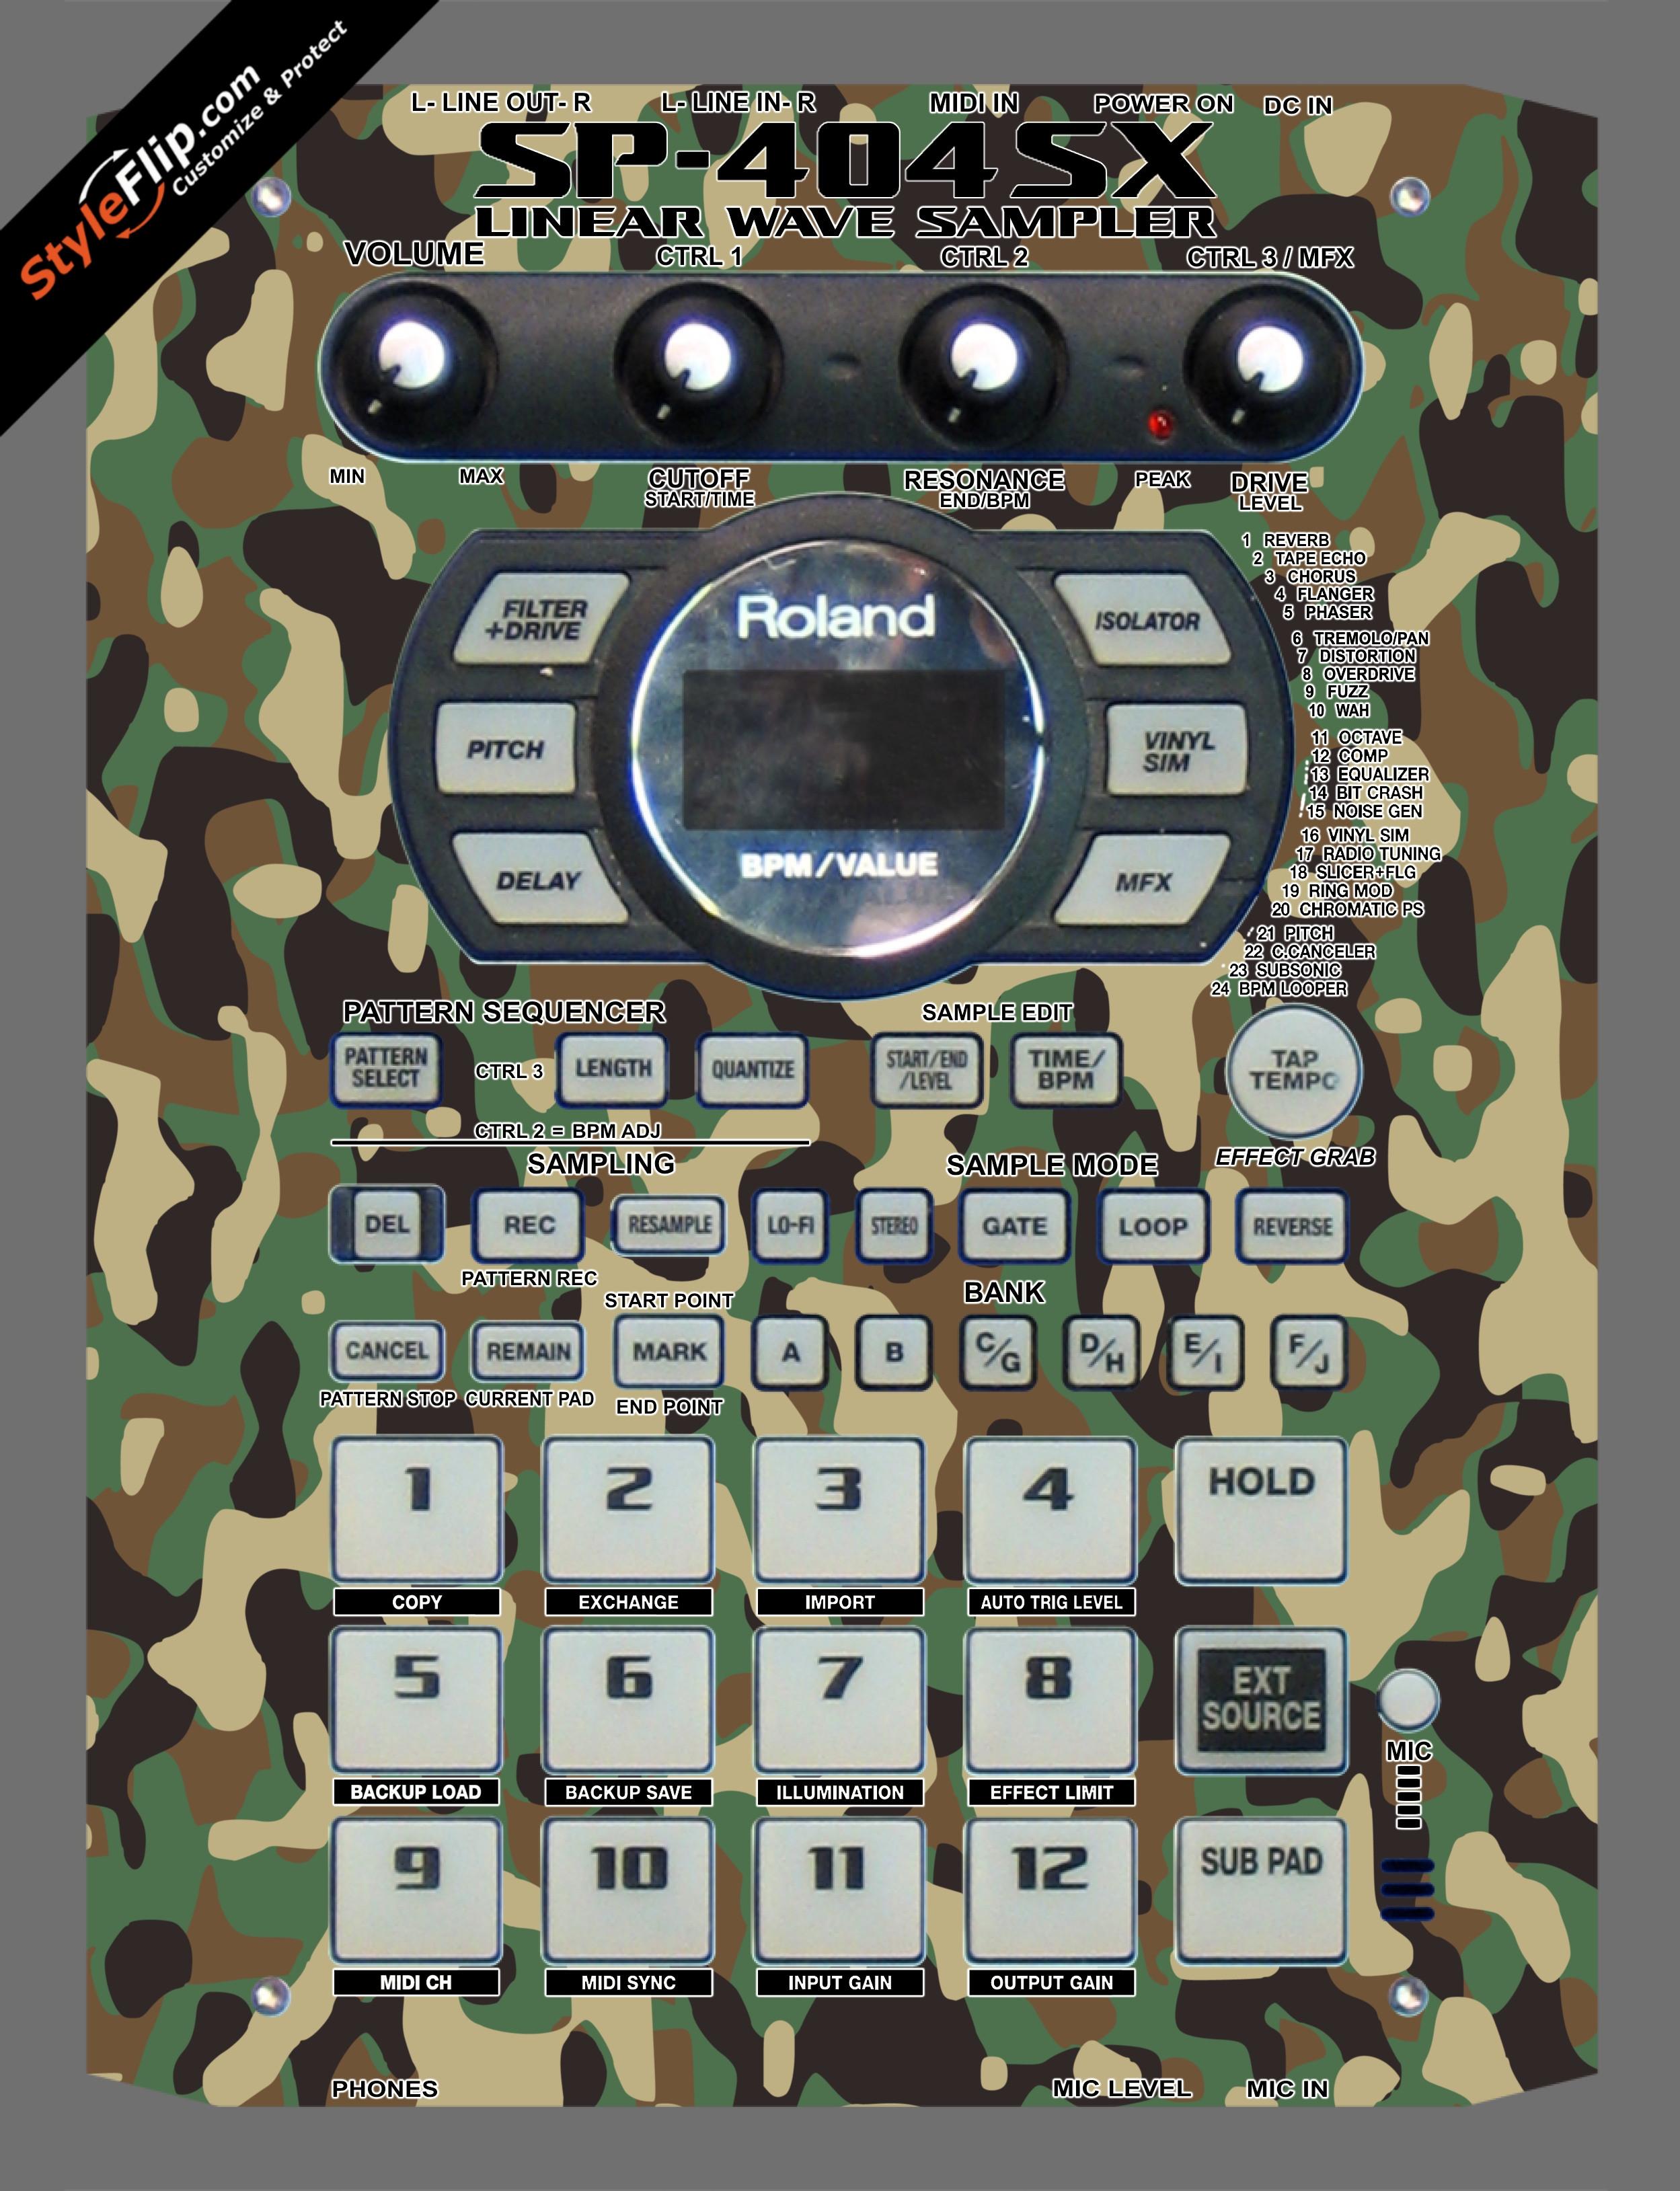 Frontline Roland SP-404 SX